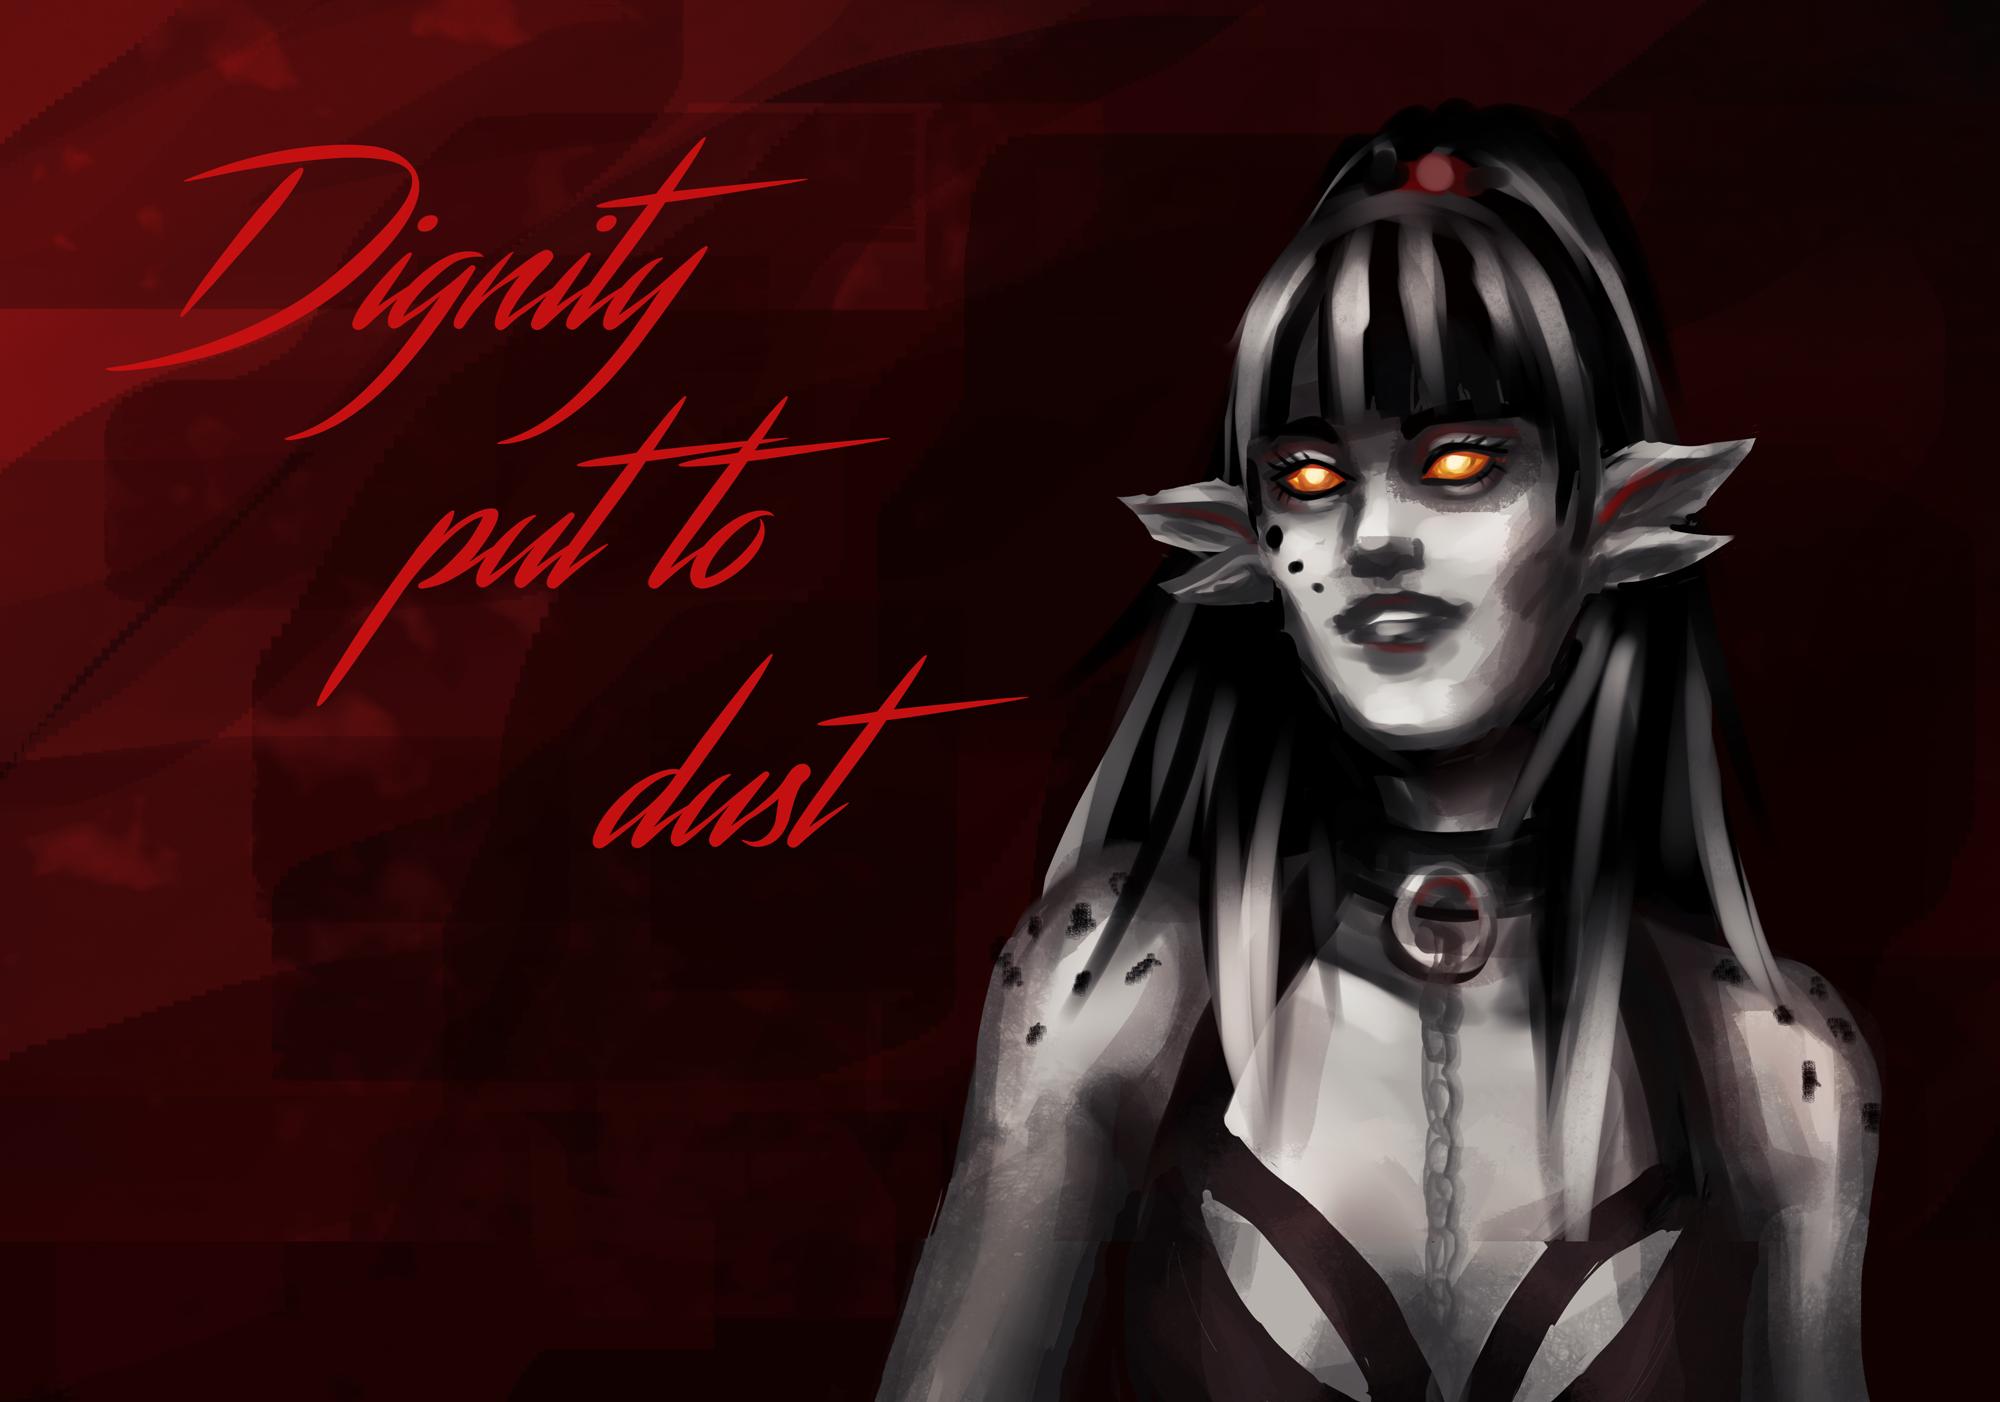 Princess of lust